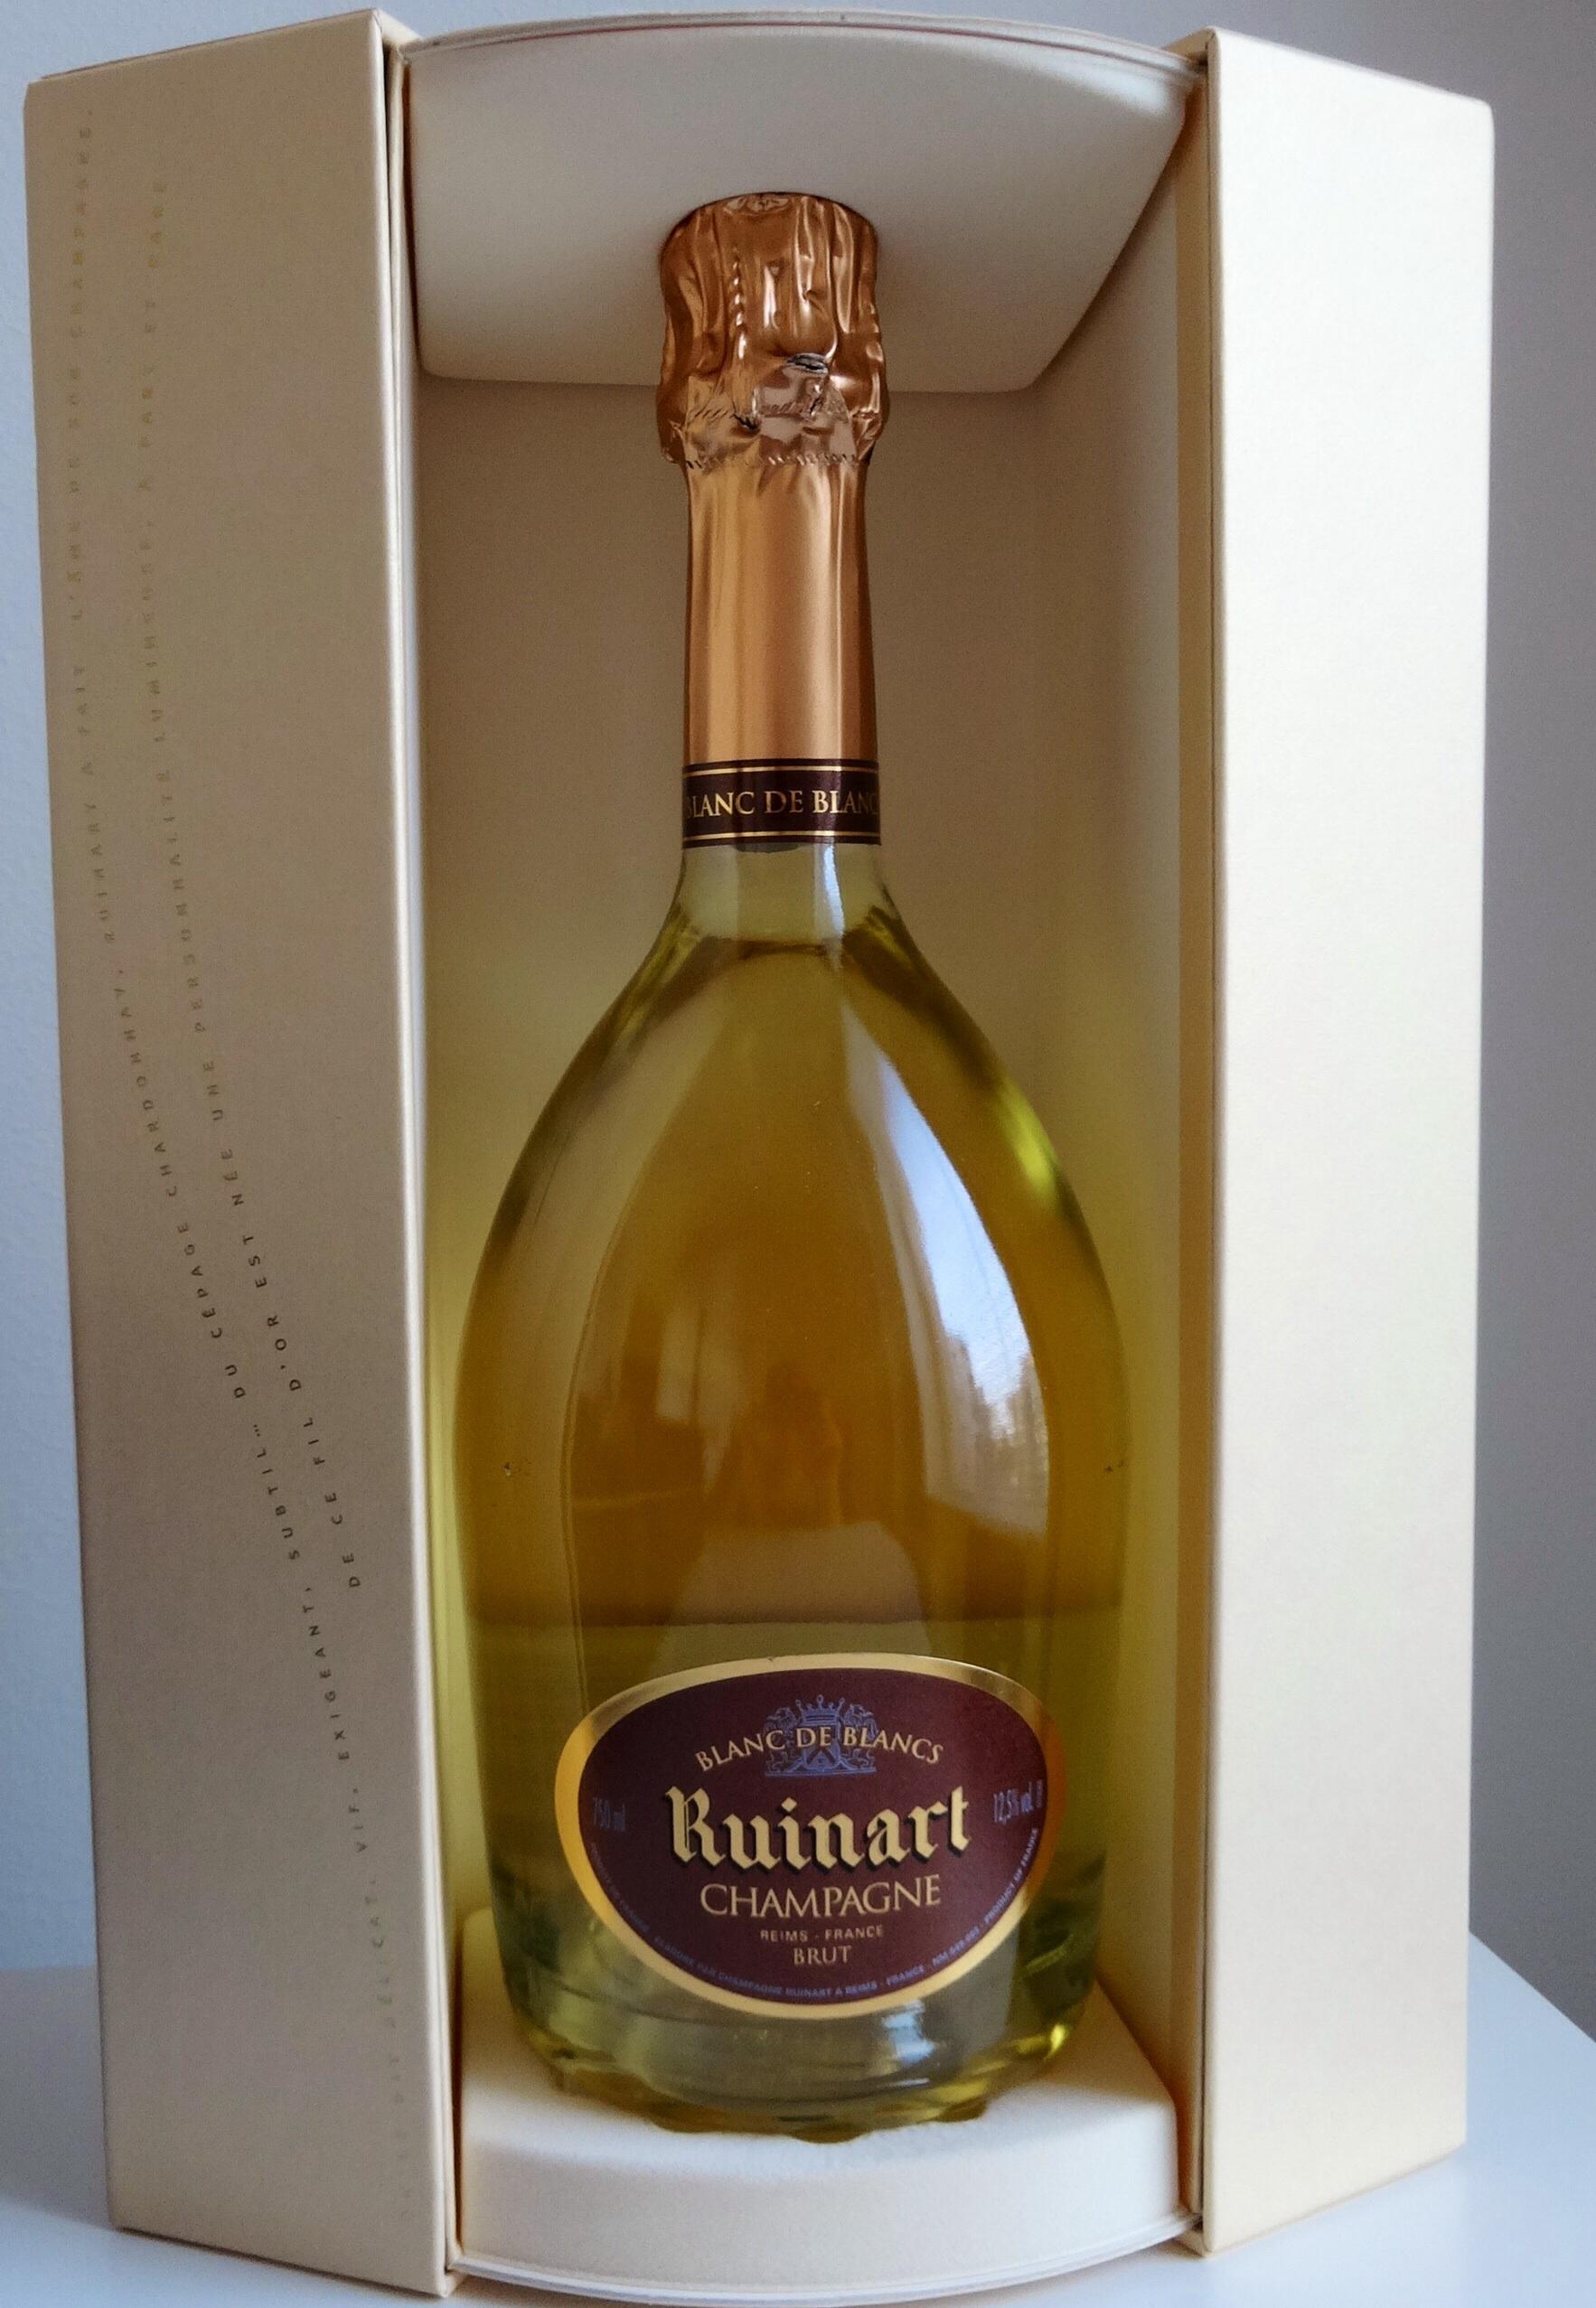 Champagne ruinart blanc de blancs reijosfood - Ruinart blanc de blanc nicolas ...